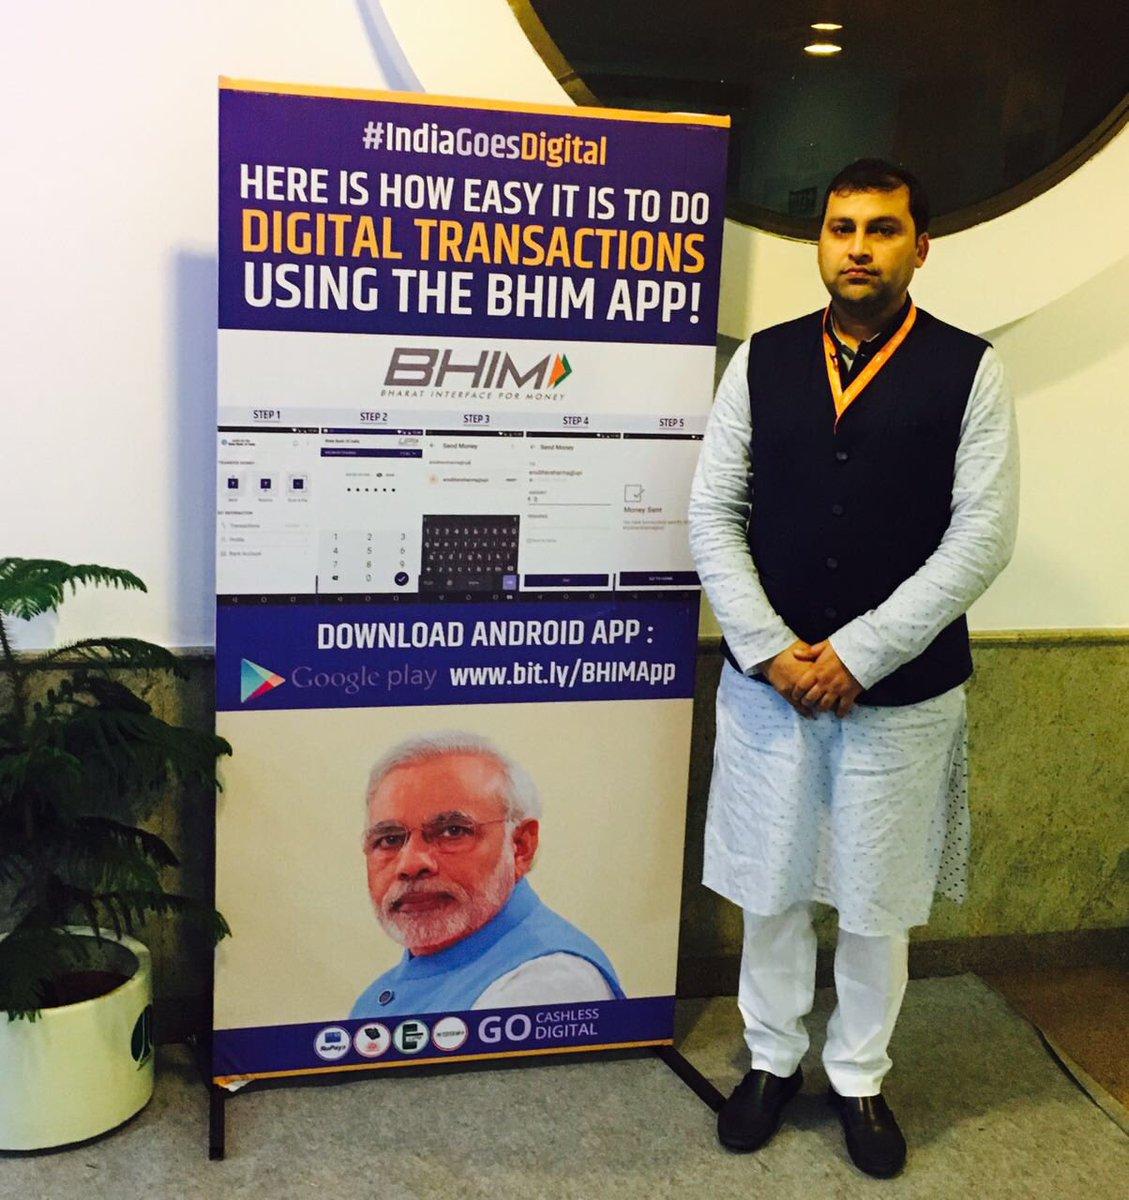 #IndiaGoesDigital use #BHIMApp for #DigitalTransactions #GoCashlessDigital @narendramodi @PMOIndia @AmitShah @ManojTiwariMP @BJP4India<br>http://pic.twitter.com/p5bUmk7GWy